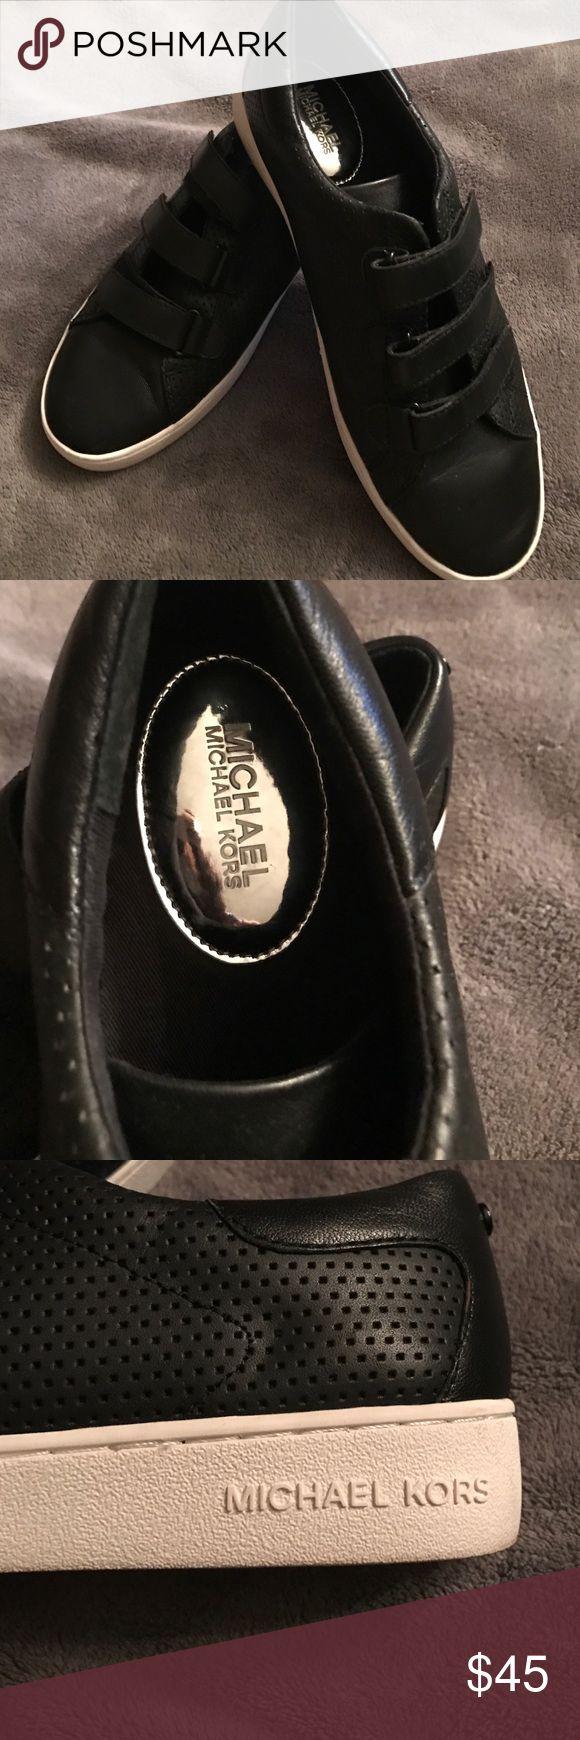 and white velcro michael kors tennis shoes michael kors shoes sneakers. Black Bedroom Furniture Sets. Home Design Ideas